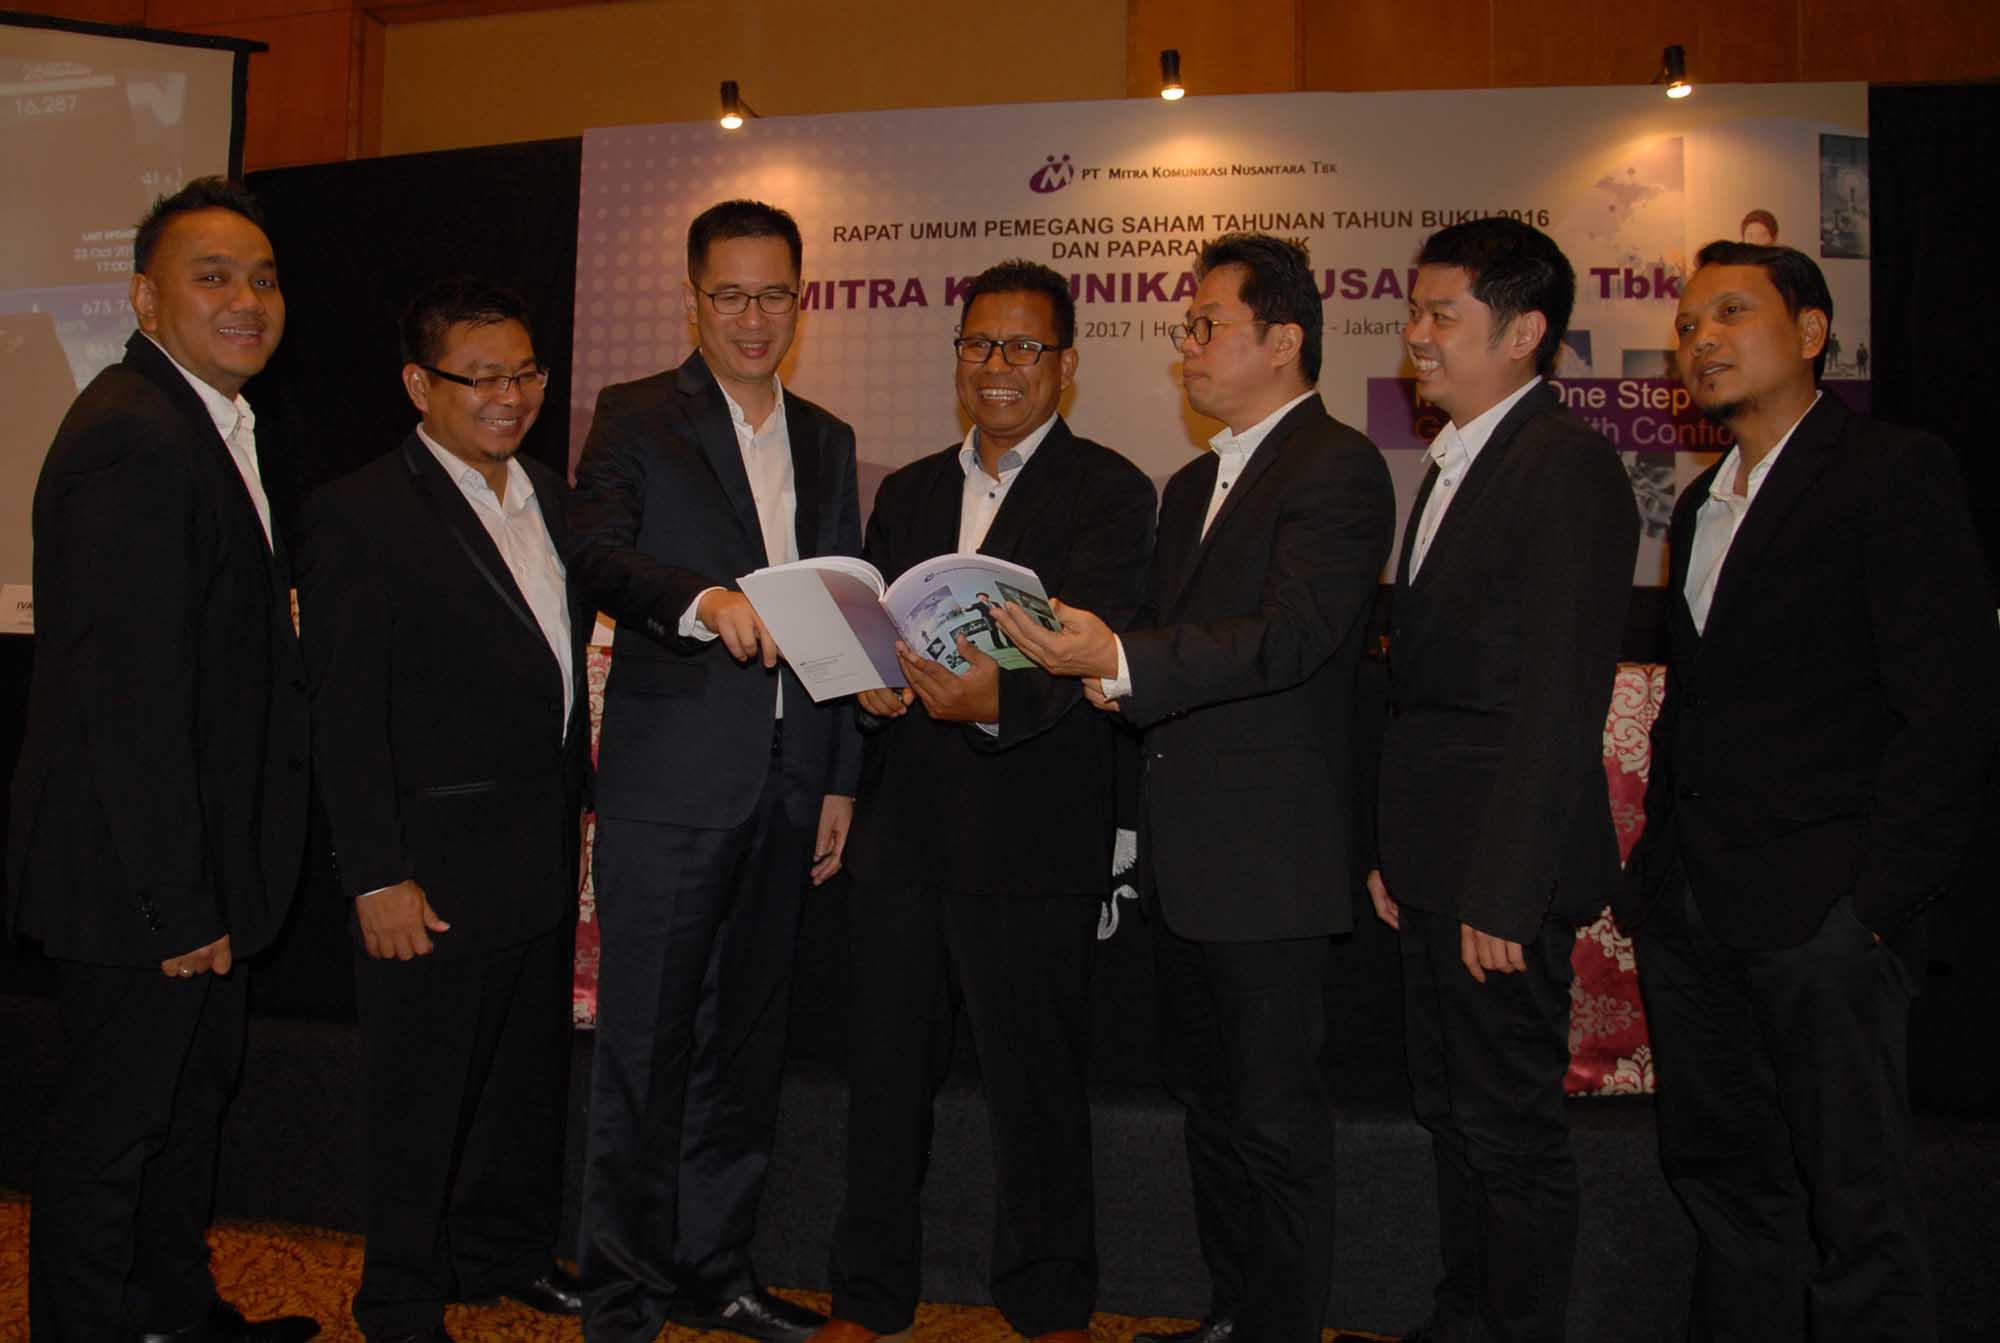 MKNT Cari Dana Lewat Private Placement - MKNT Terbitkan 500 Juta Saham Baru | Neraca.co.id